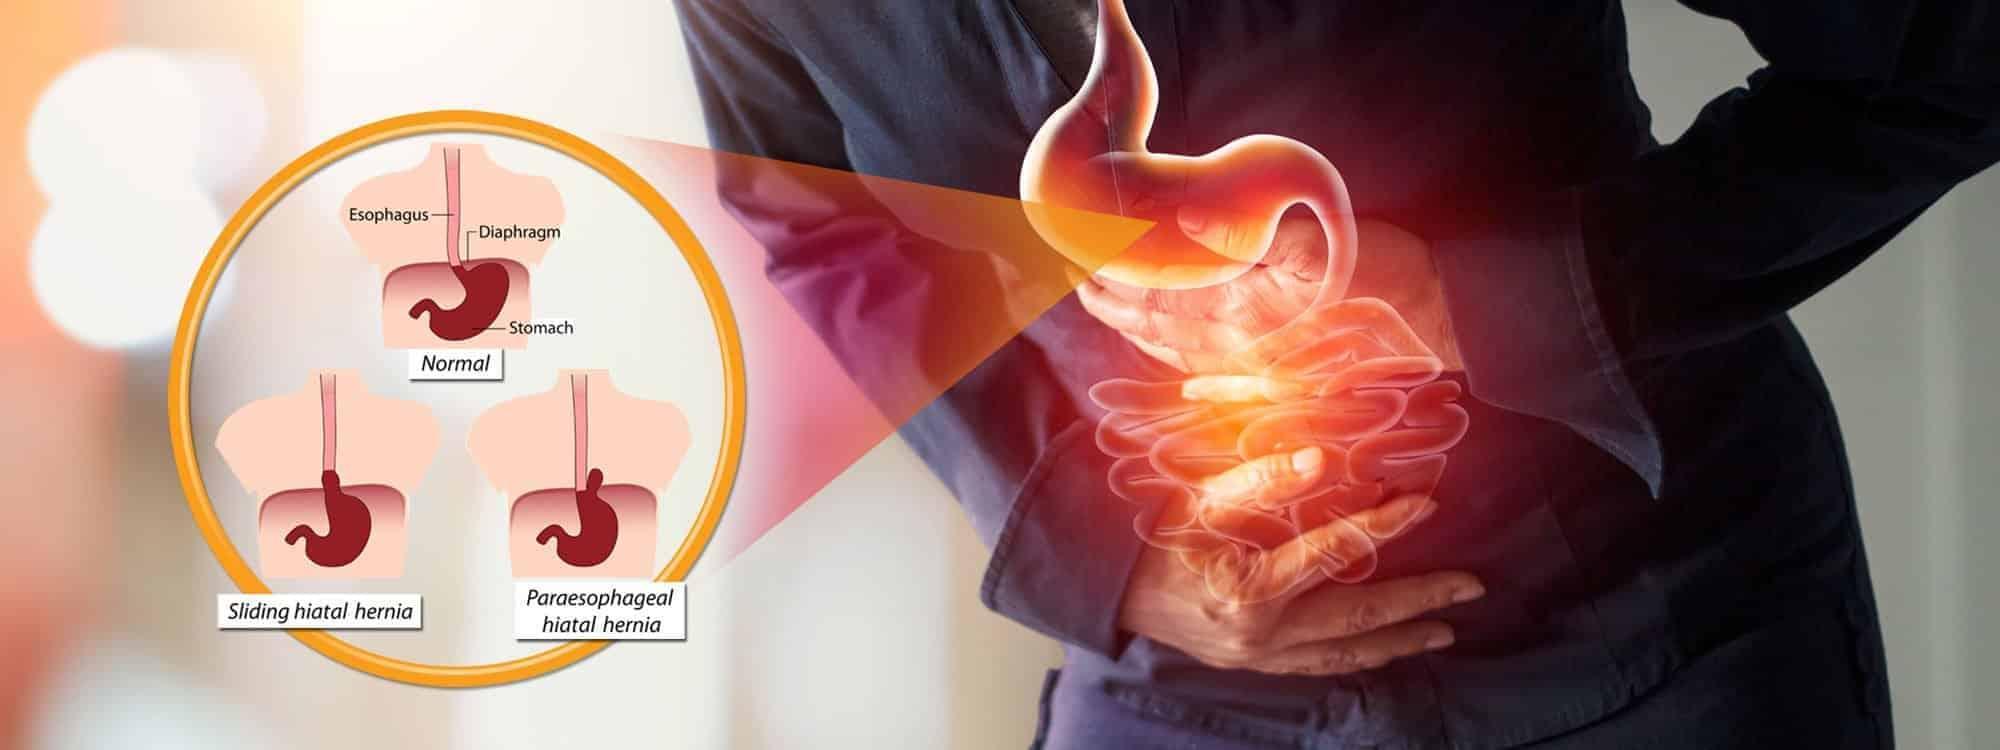 Hiatal Hernia Treatment Through Chiropractic Care